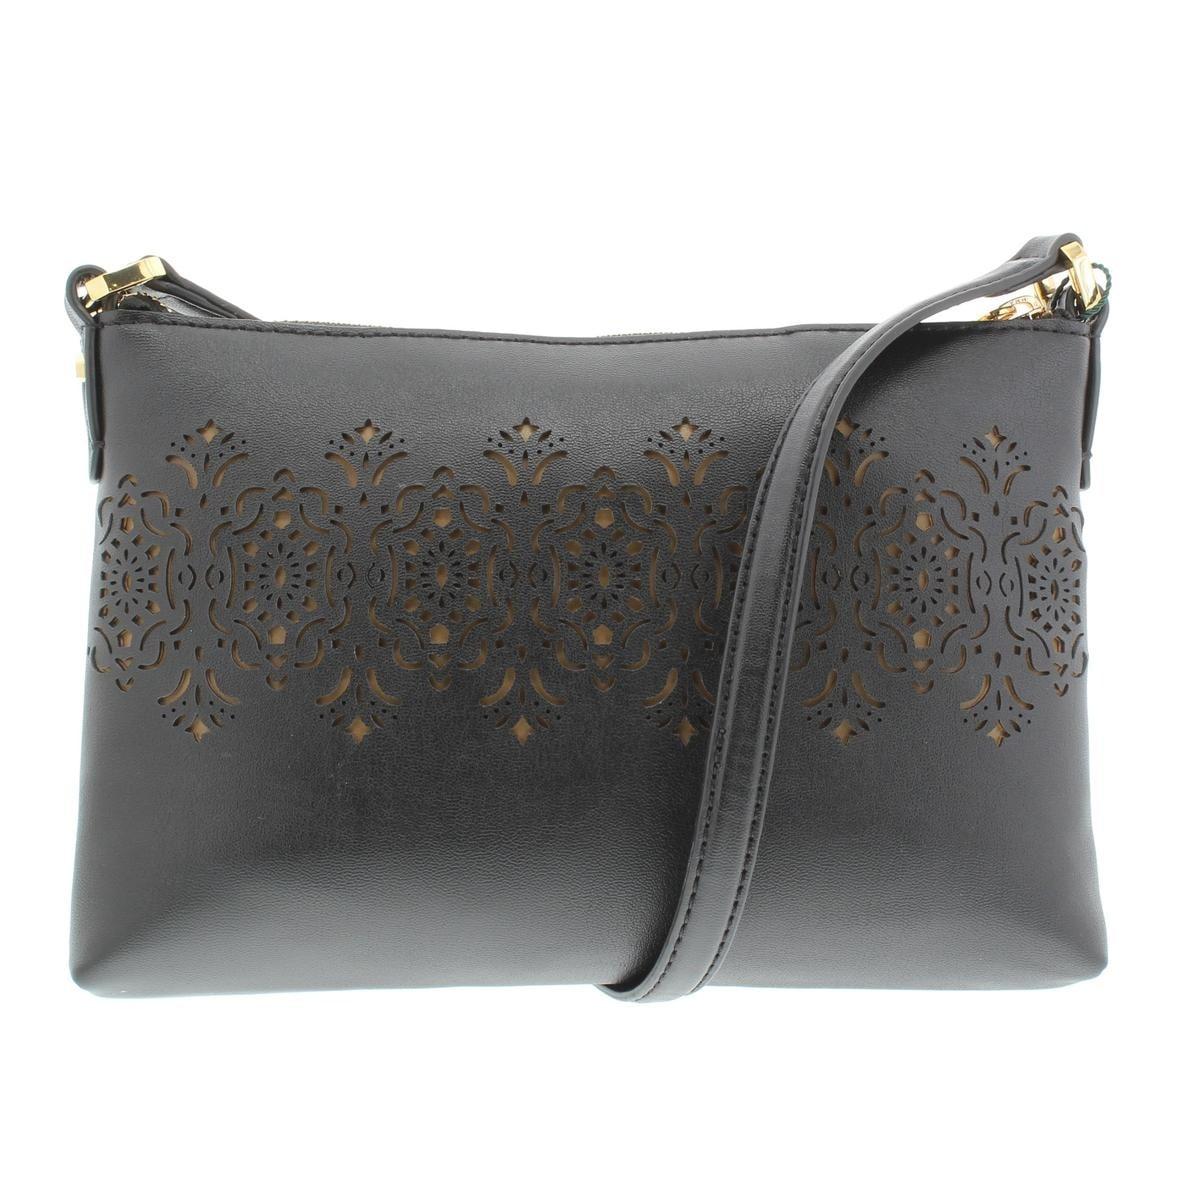 99703d2b4b5b Shop Lauren Ralph Lauren Womens Lauderdale Tasmine Shoulder Handbag Faux  Leather - small - Free Shipping Today - Overstock - 22733865